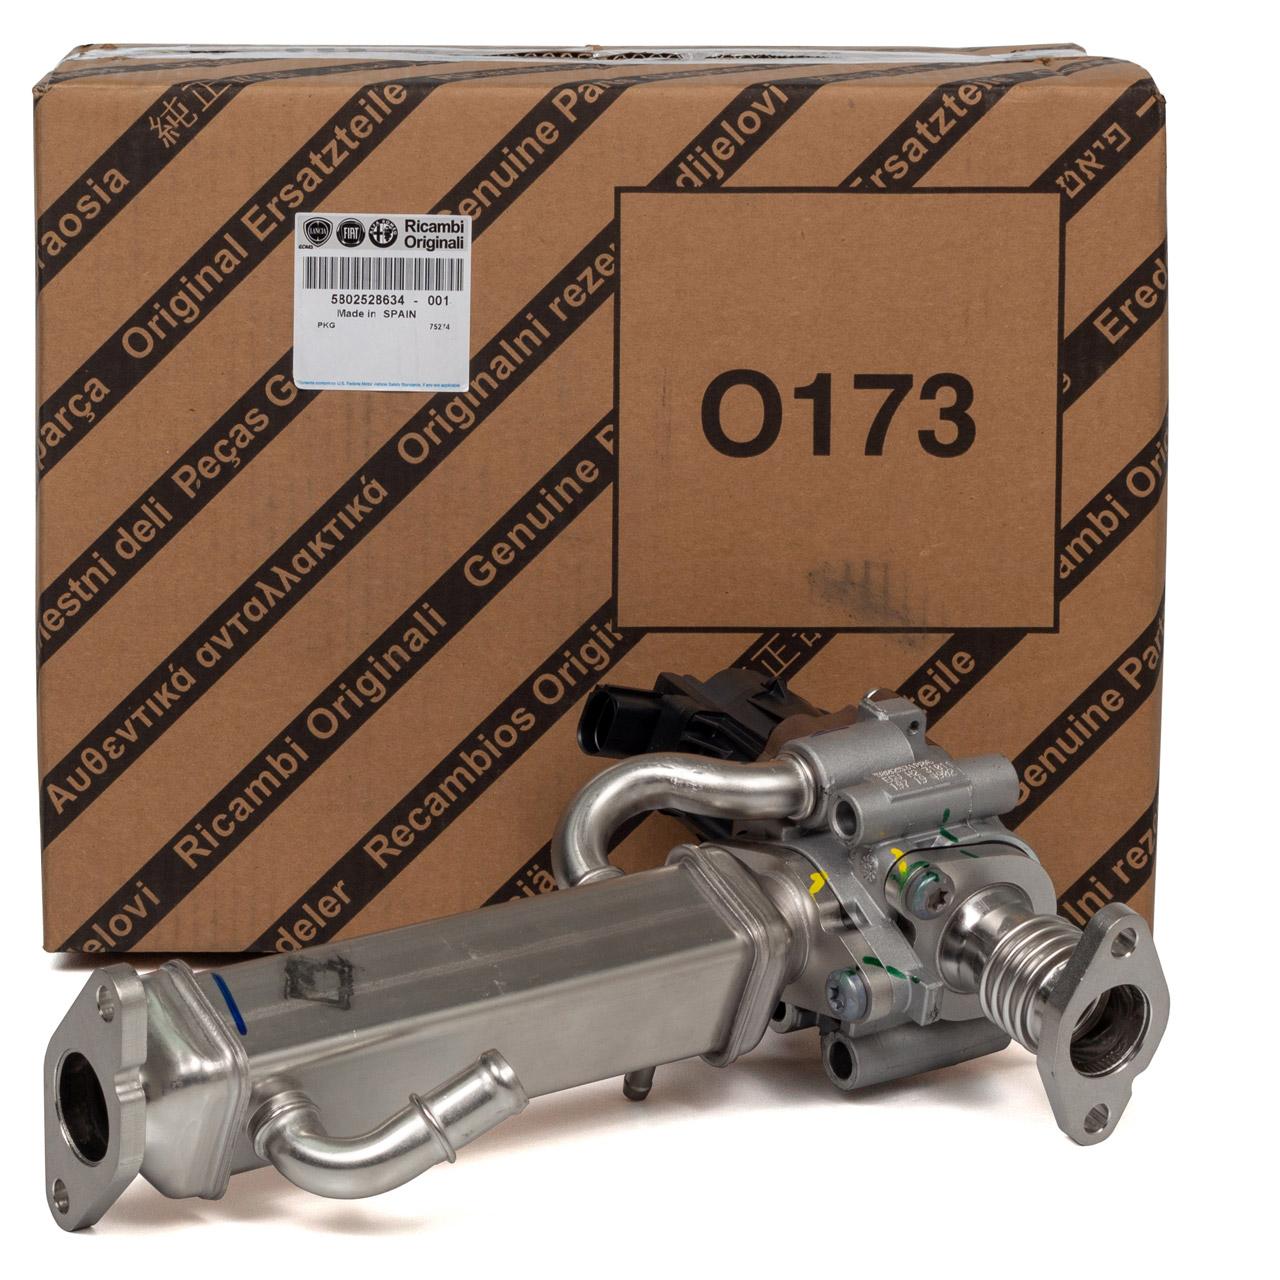 ORIGINAL Fiat AGR Ventil Abgasrückführungsventil Wärmetauscher DUCATO 5802528634